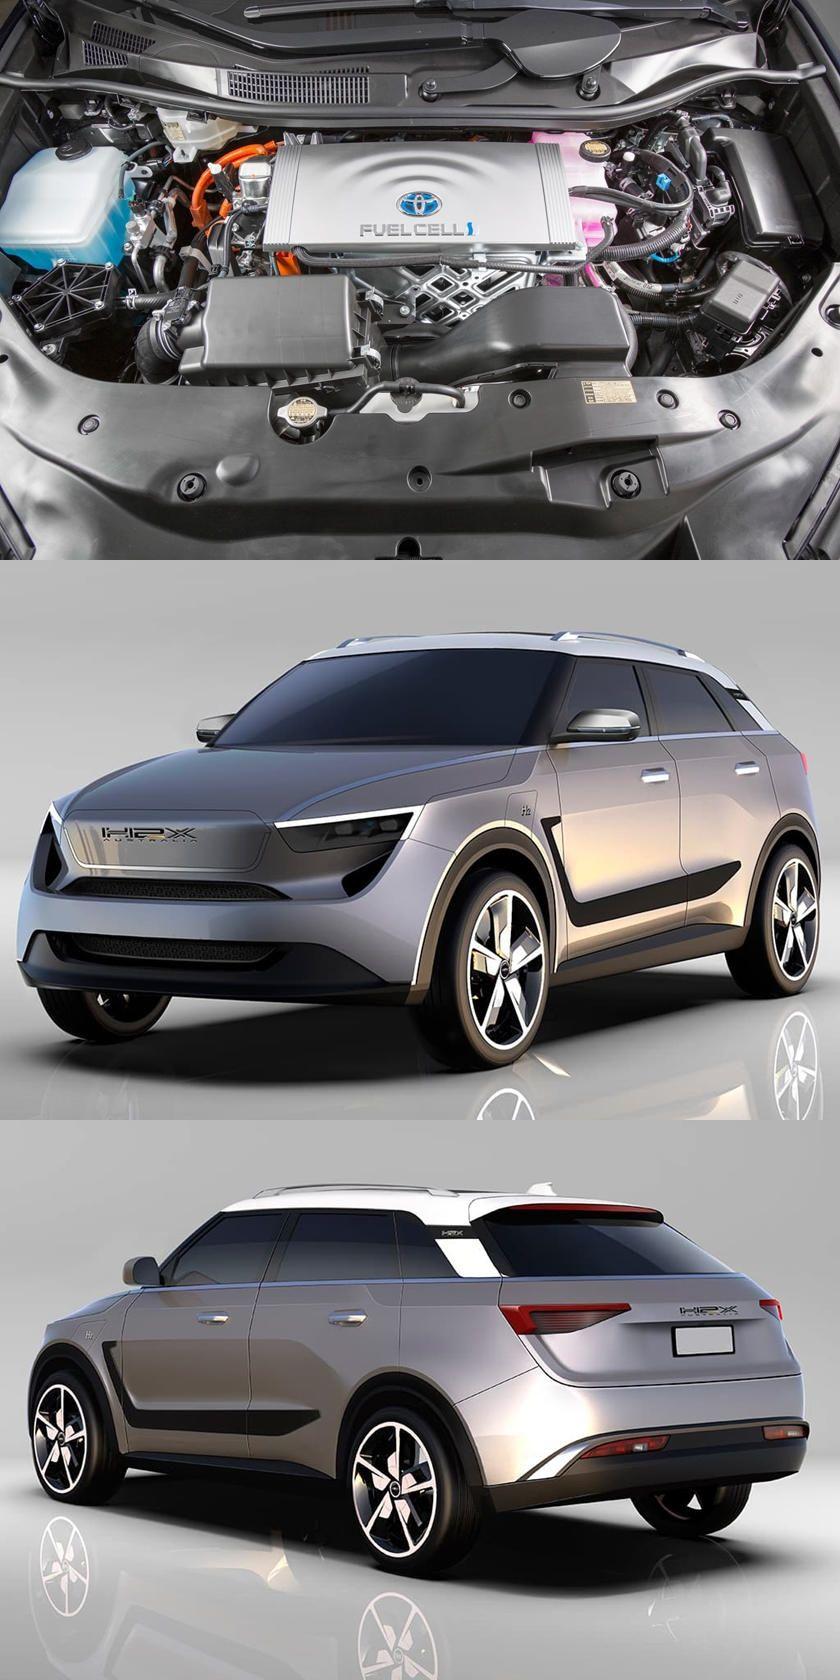 Meet Australia's New Hydrogen Car. It is set to show face